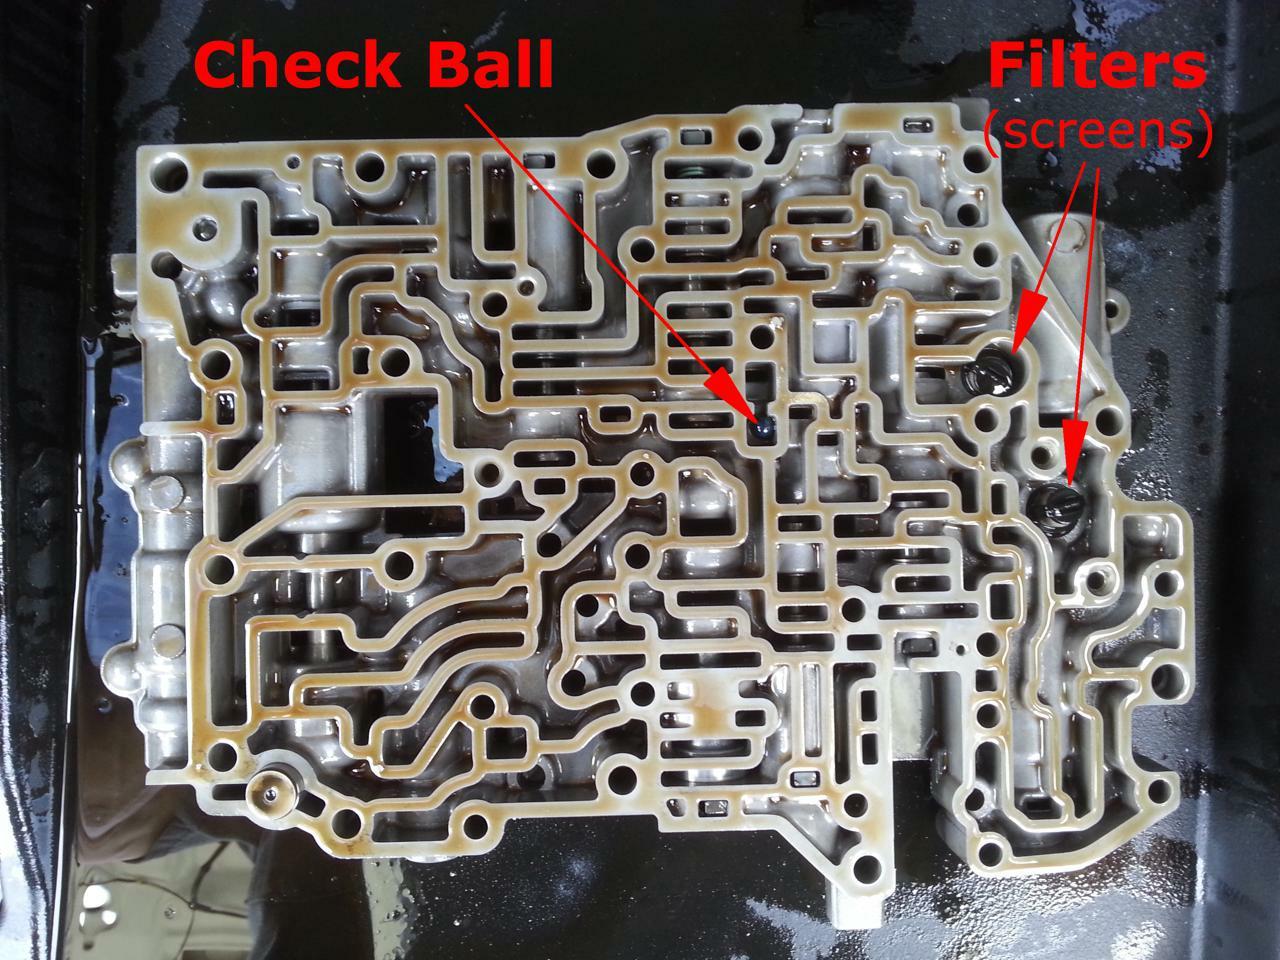 hight resolution of toyota a541e valve body check ball and vibrating stopper 4l60e accumulator diagram 1996 4l60e valve body